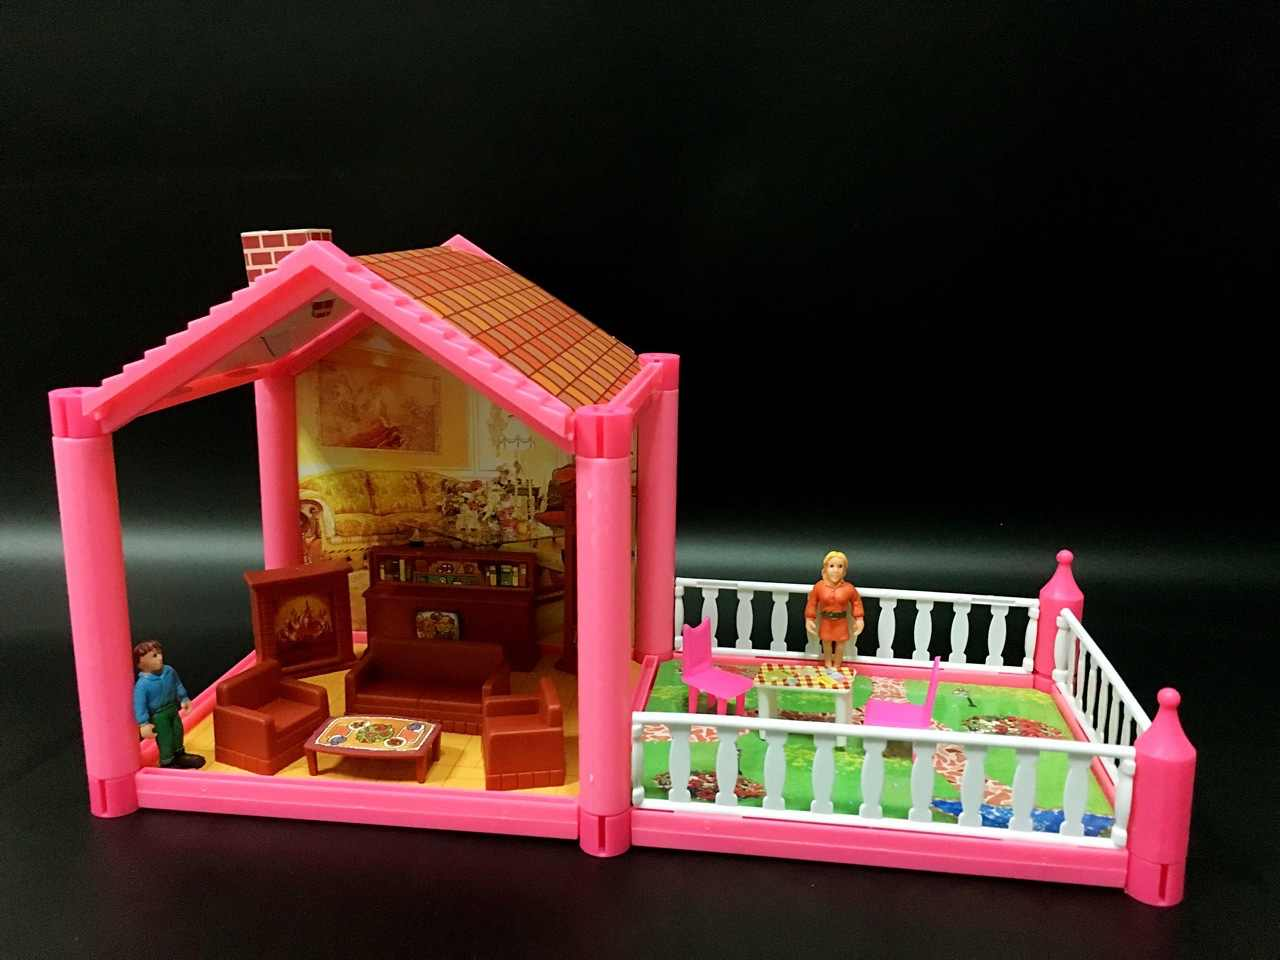 Boneka DIY Rumah Kit Aksesoris Miniatur Furnitur Rumah Boneka Miniatur Mini Kamar Boneka Mobil Anjing Gadis Mainan Coffe Table Mainan Anak